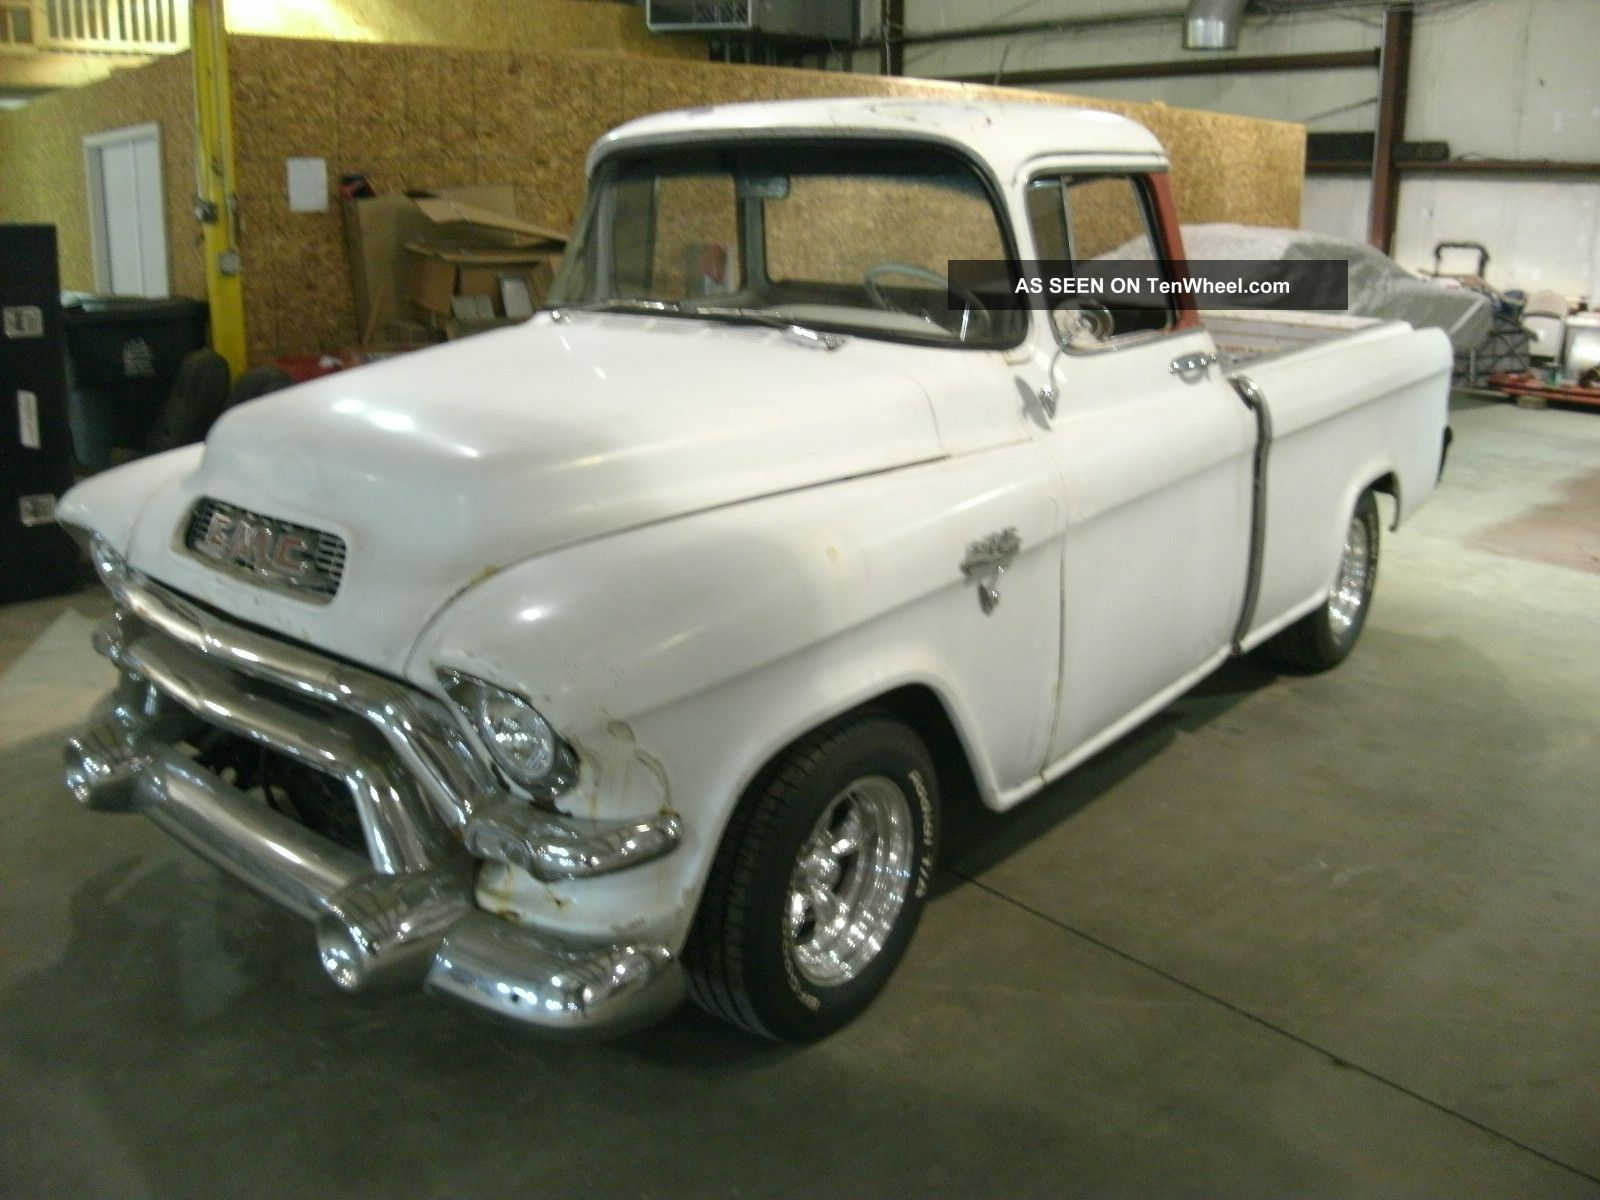 1956 Gmc Cameo Suburban Carrier Rare Chevy Truck Hot Rod Classic V 8 Auto